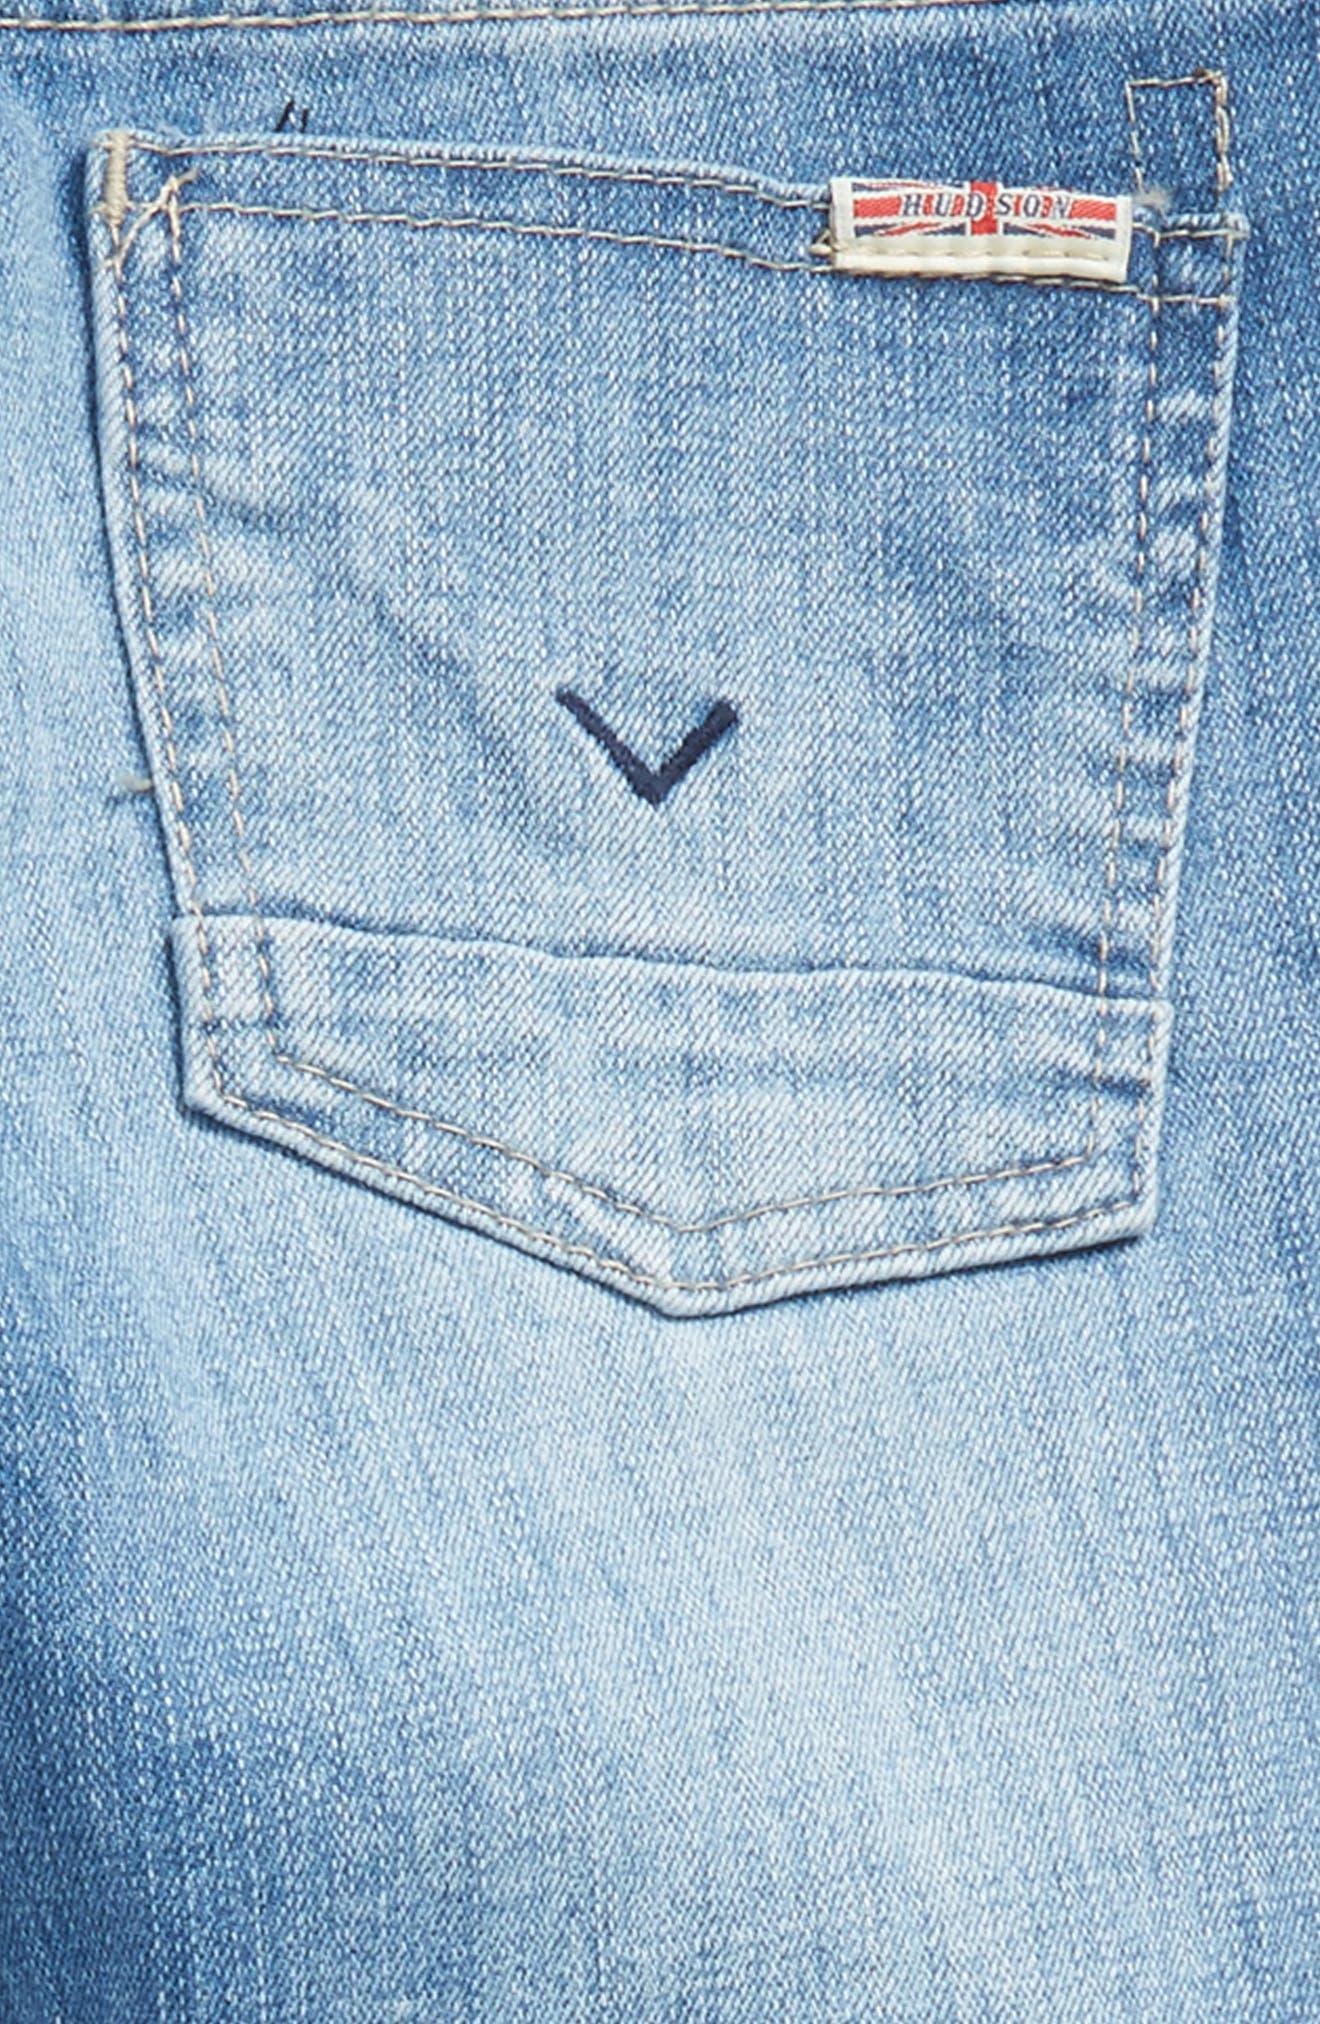 Jude Skinny Jeans,                             Alternate thumbnail 3, color,                             Stone Wash